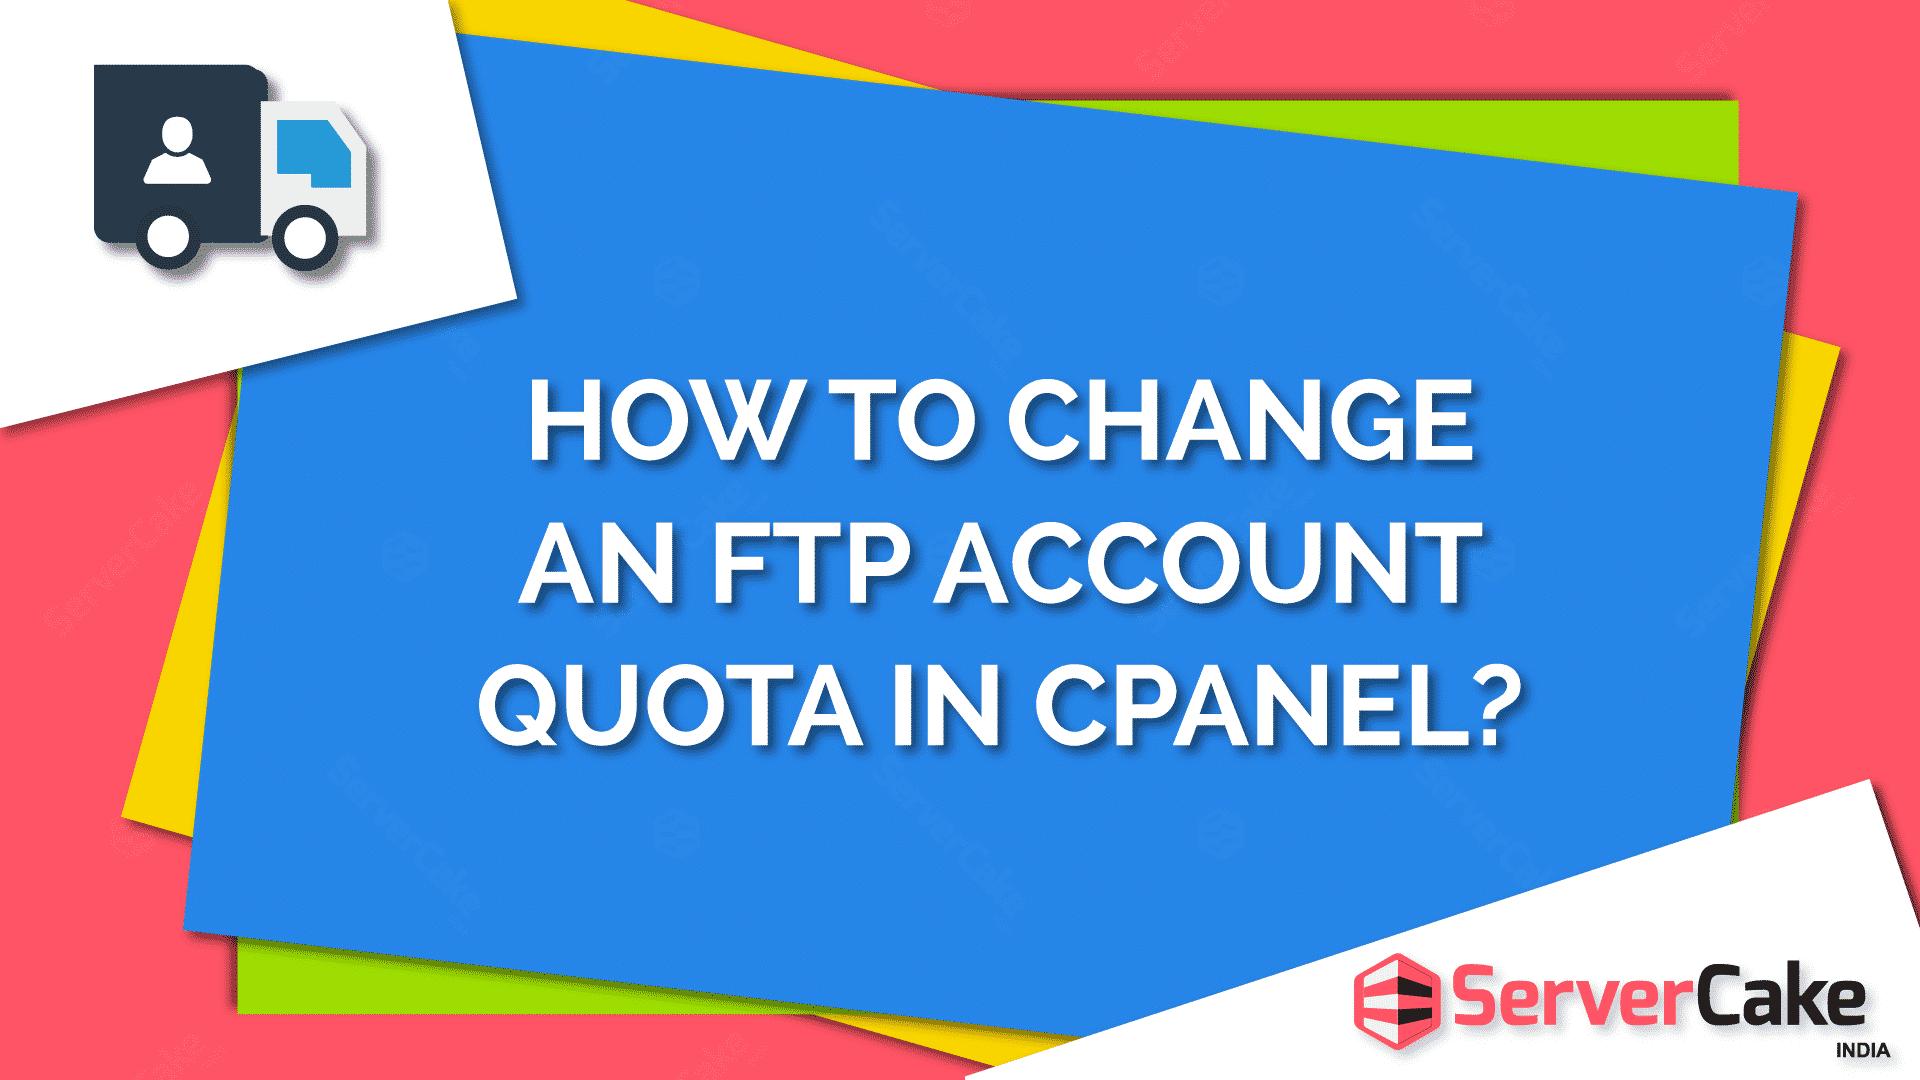 Change an FTP account